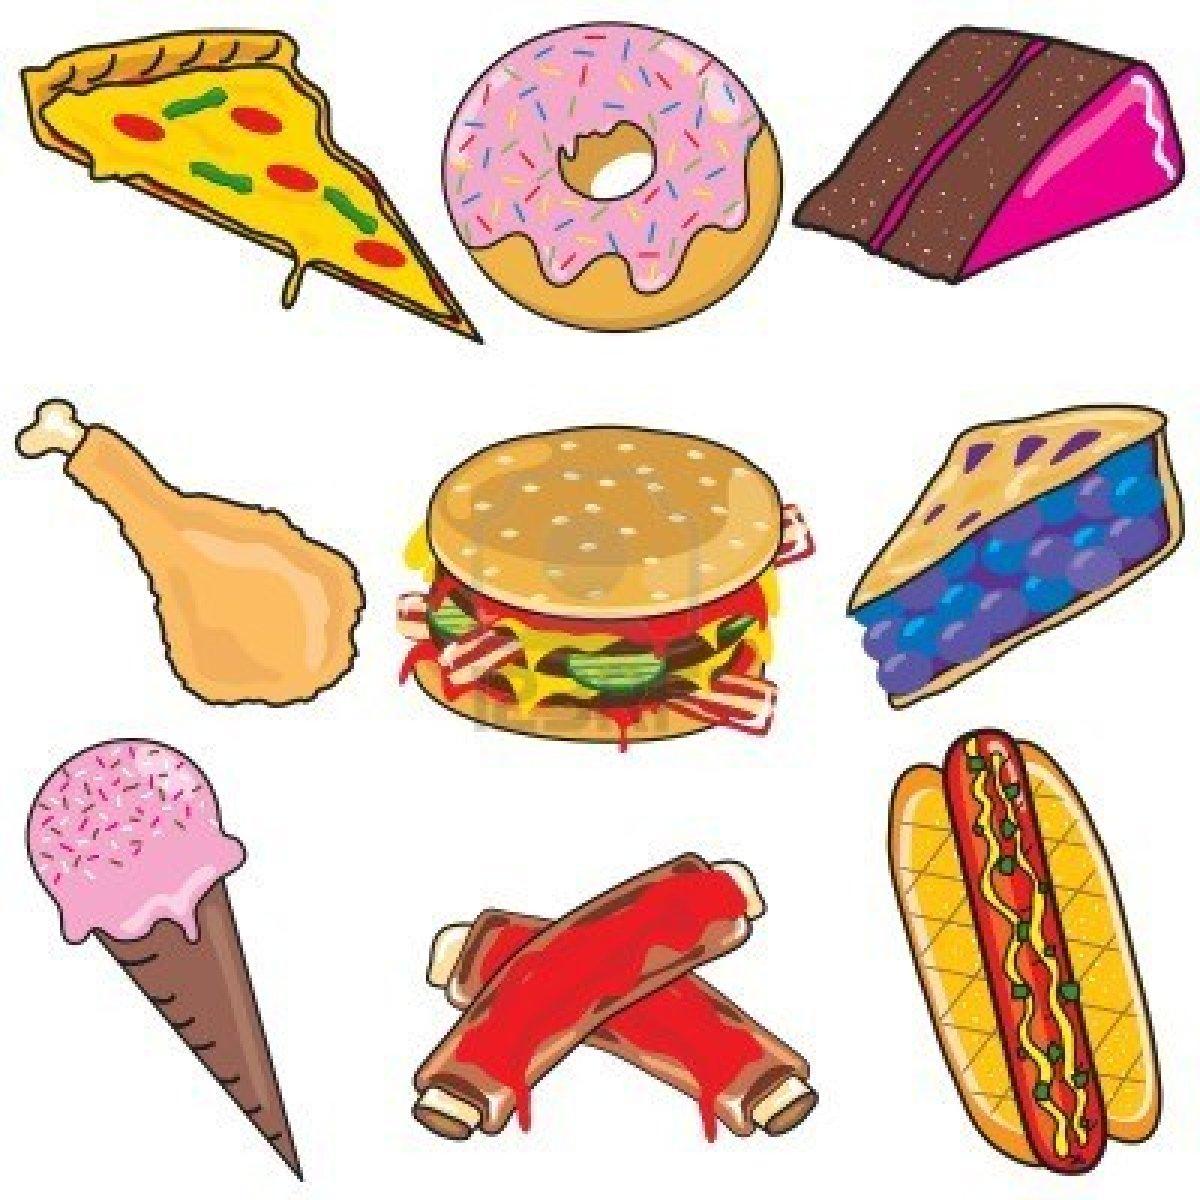 1200x1200 Free Food Clip Art Images Clipart 2 3